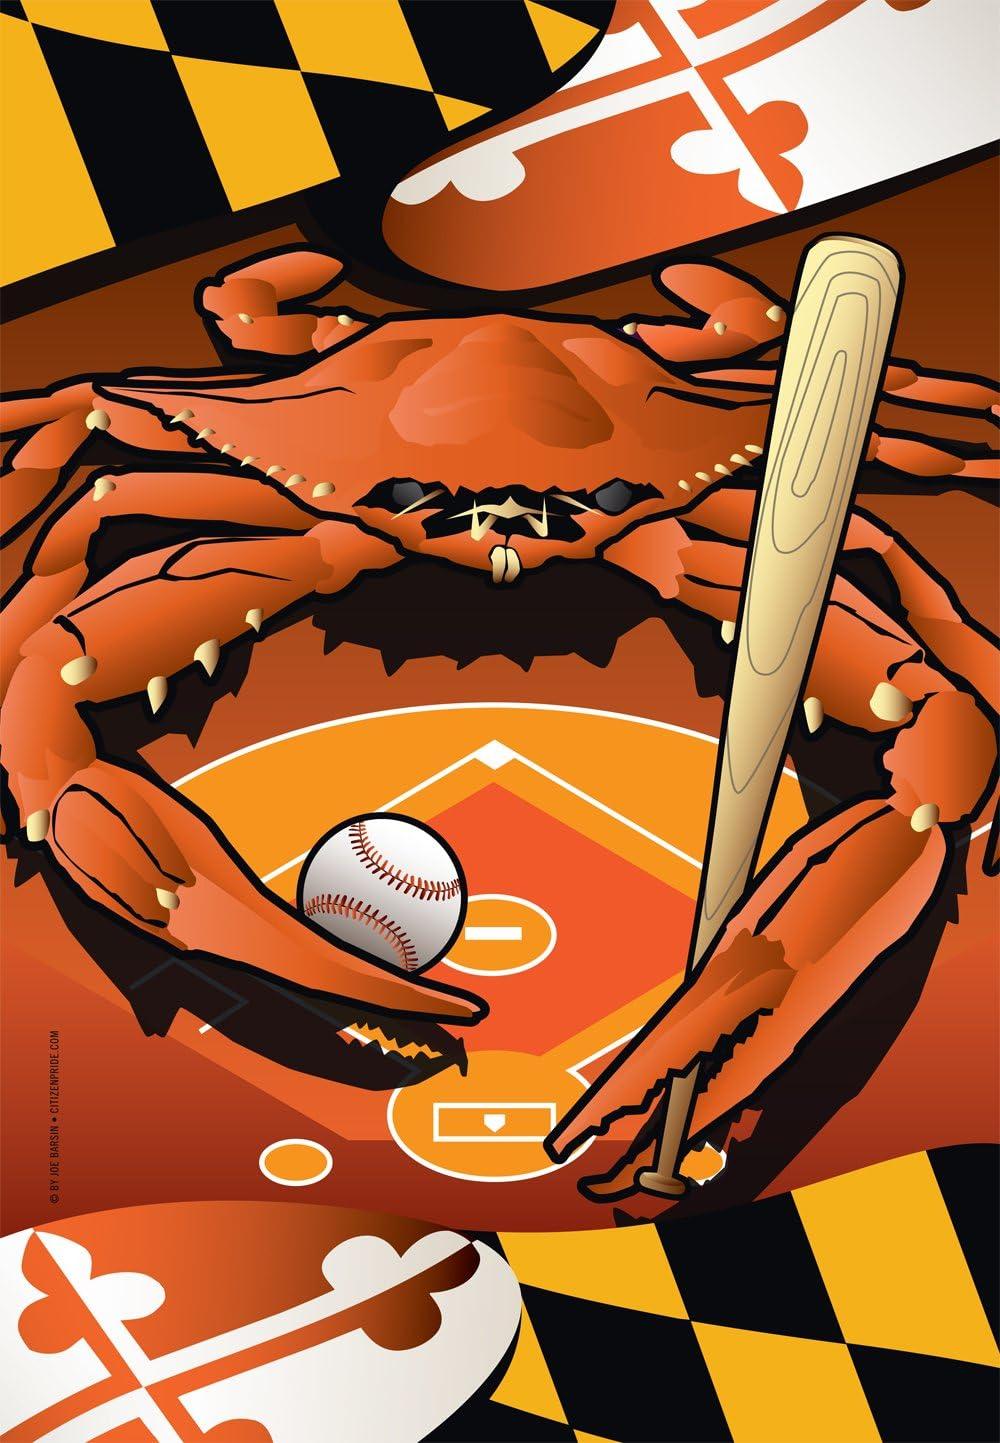 Citizen Pride Orioles Sports Crab of Baltimore Garden Flag by Joe Barsin 12 x 18-Inch Decorative USA-Produced